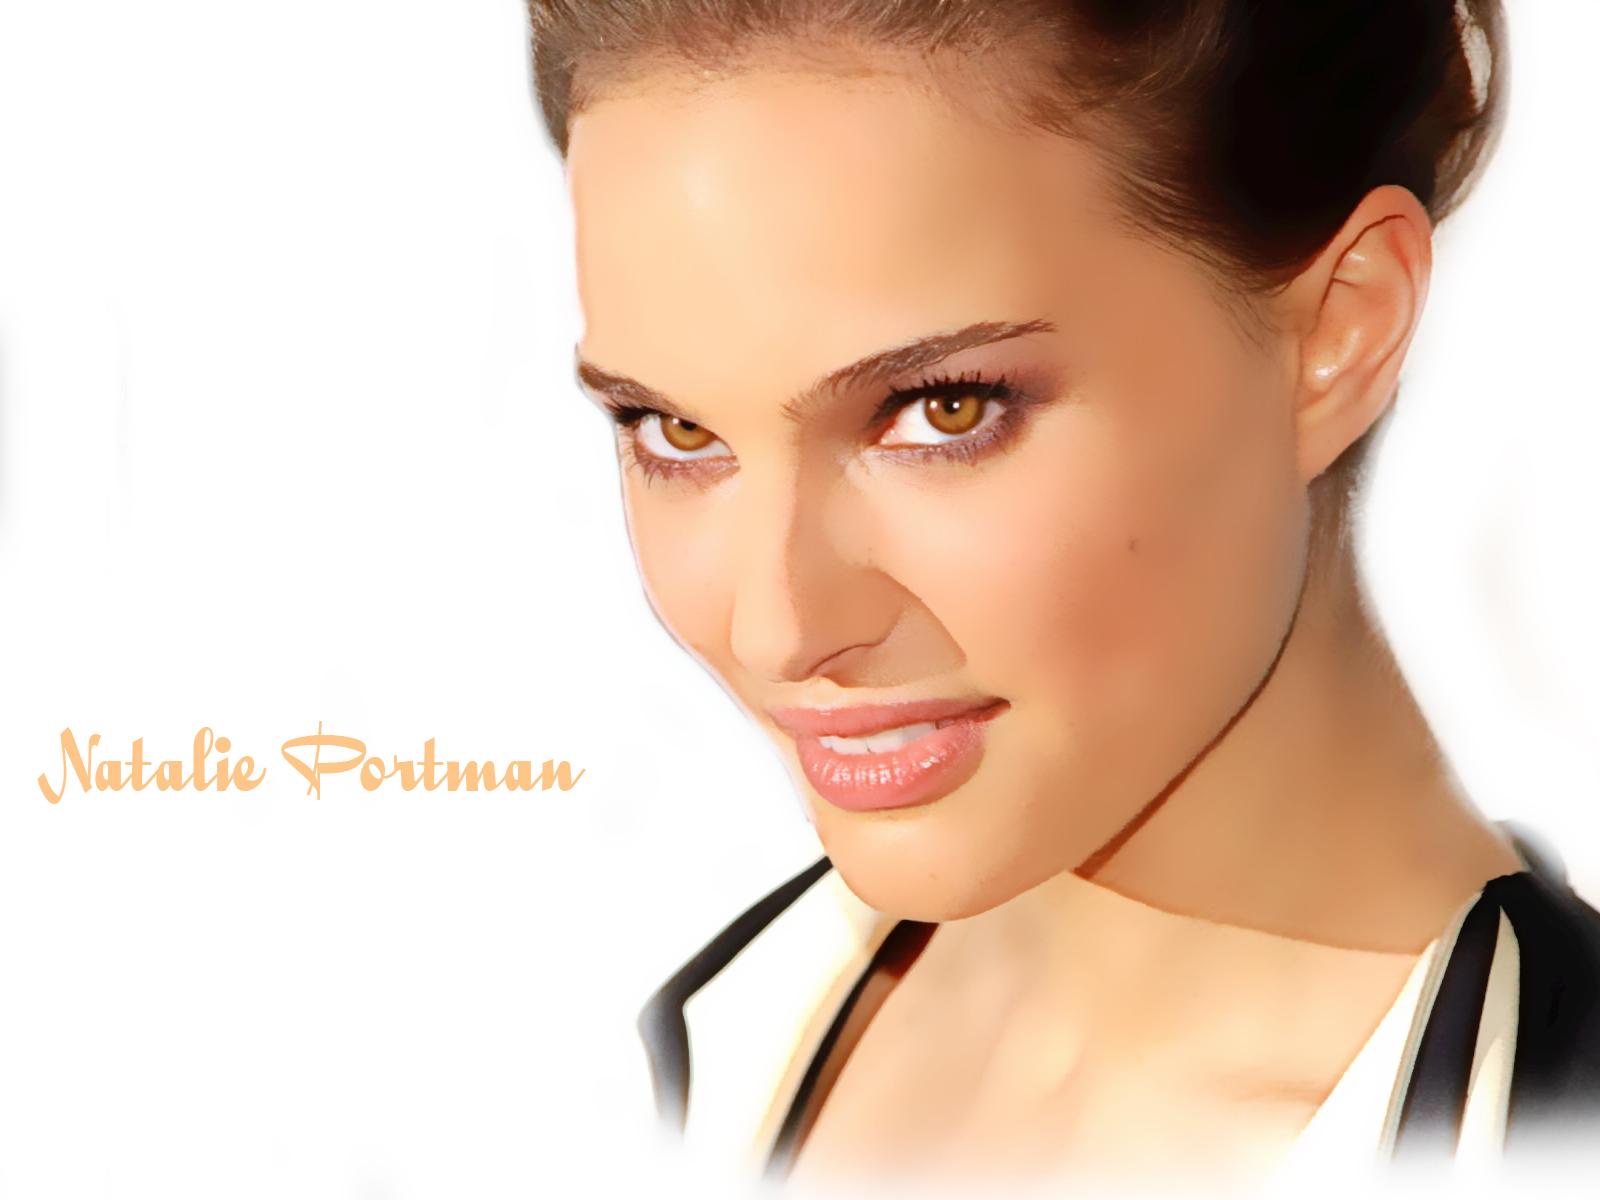 http://1.bp.blogspot.com/-OyN06Rv3DjE/T6SV2K52FJI/AAAAAAAAKj8/g69cPvF97vY/s1600/Natalie_Portman_30661.jpg